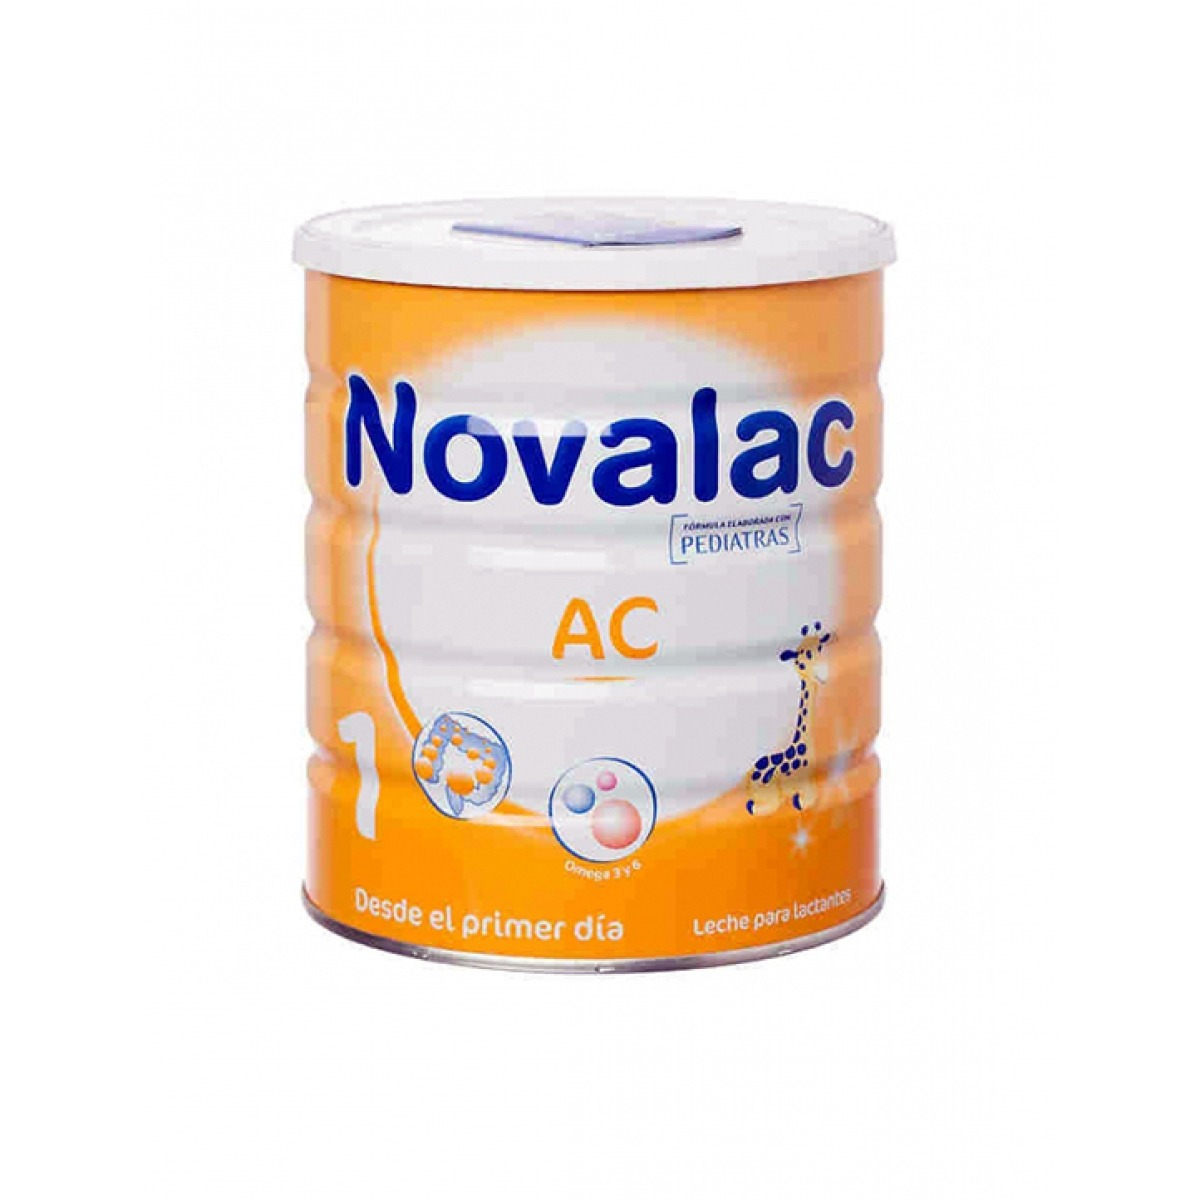 NOVALAC AC 1 LECHE DE INICIO 800 G.